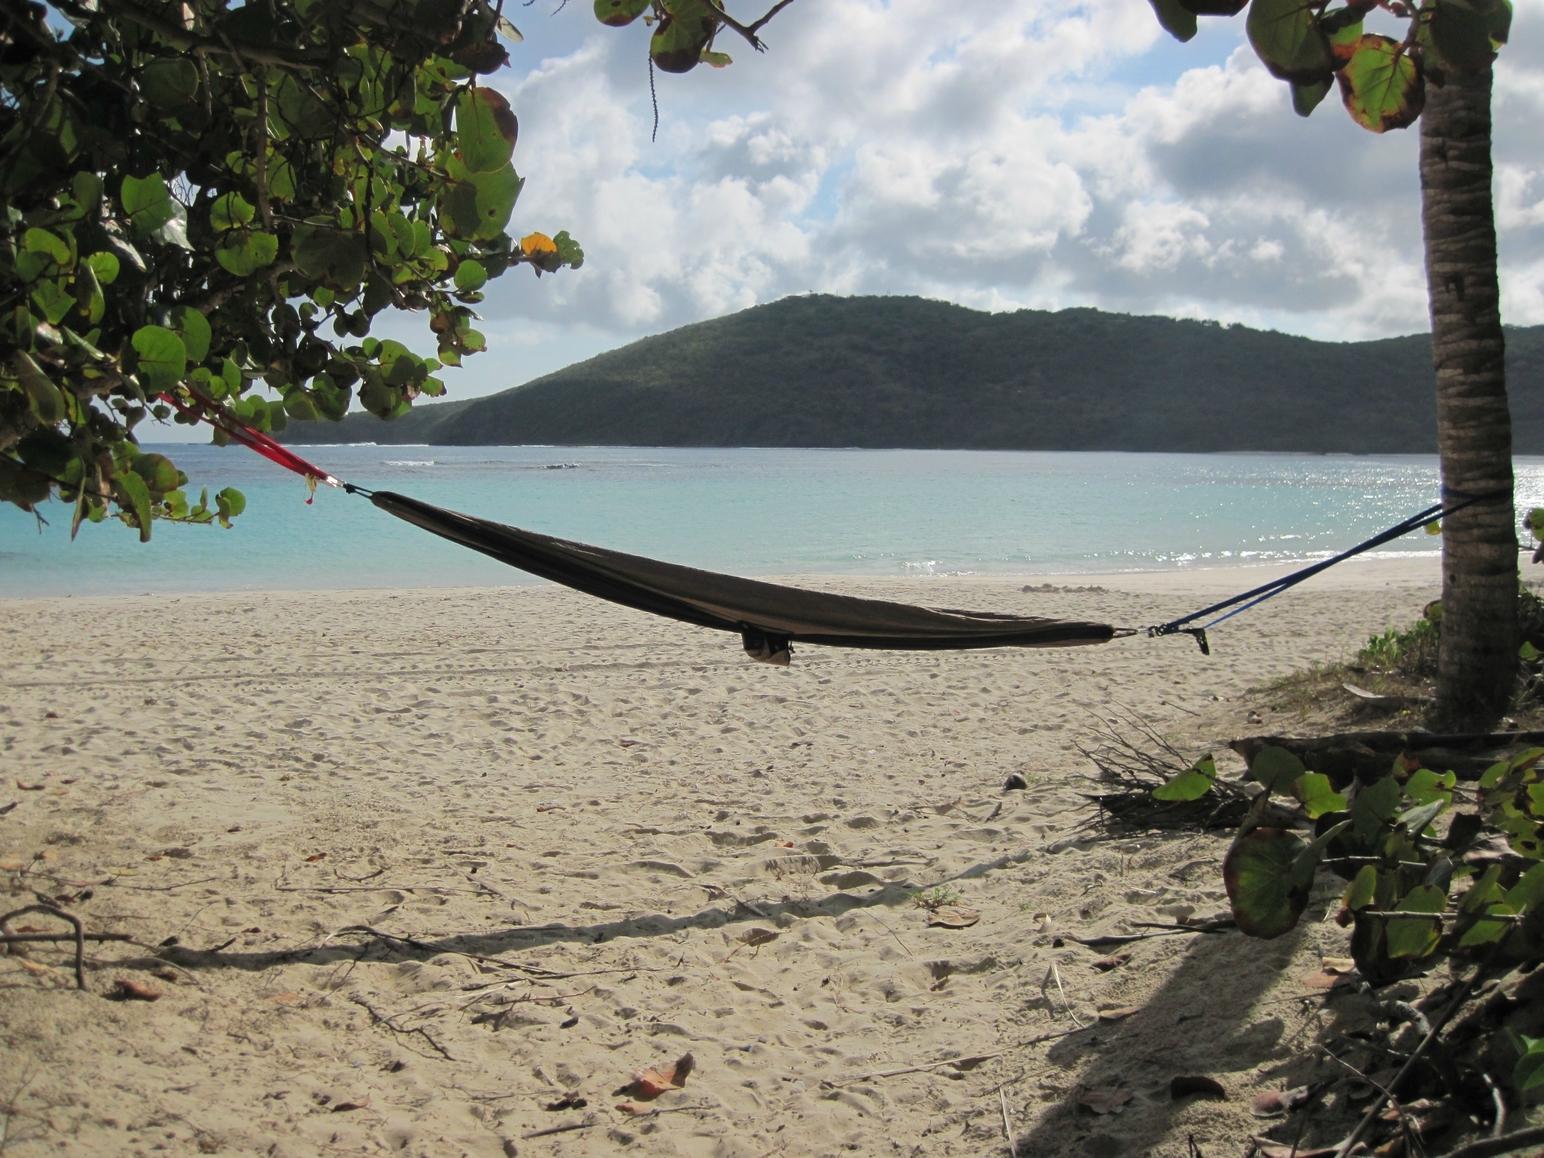 Flamenco Beach (Playa Flamenco), Culebra, Puerto Rico. Photo: TripAdvisor